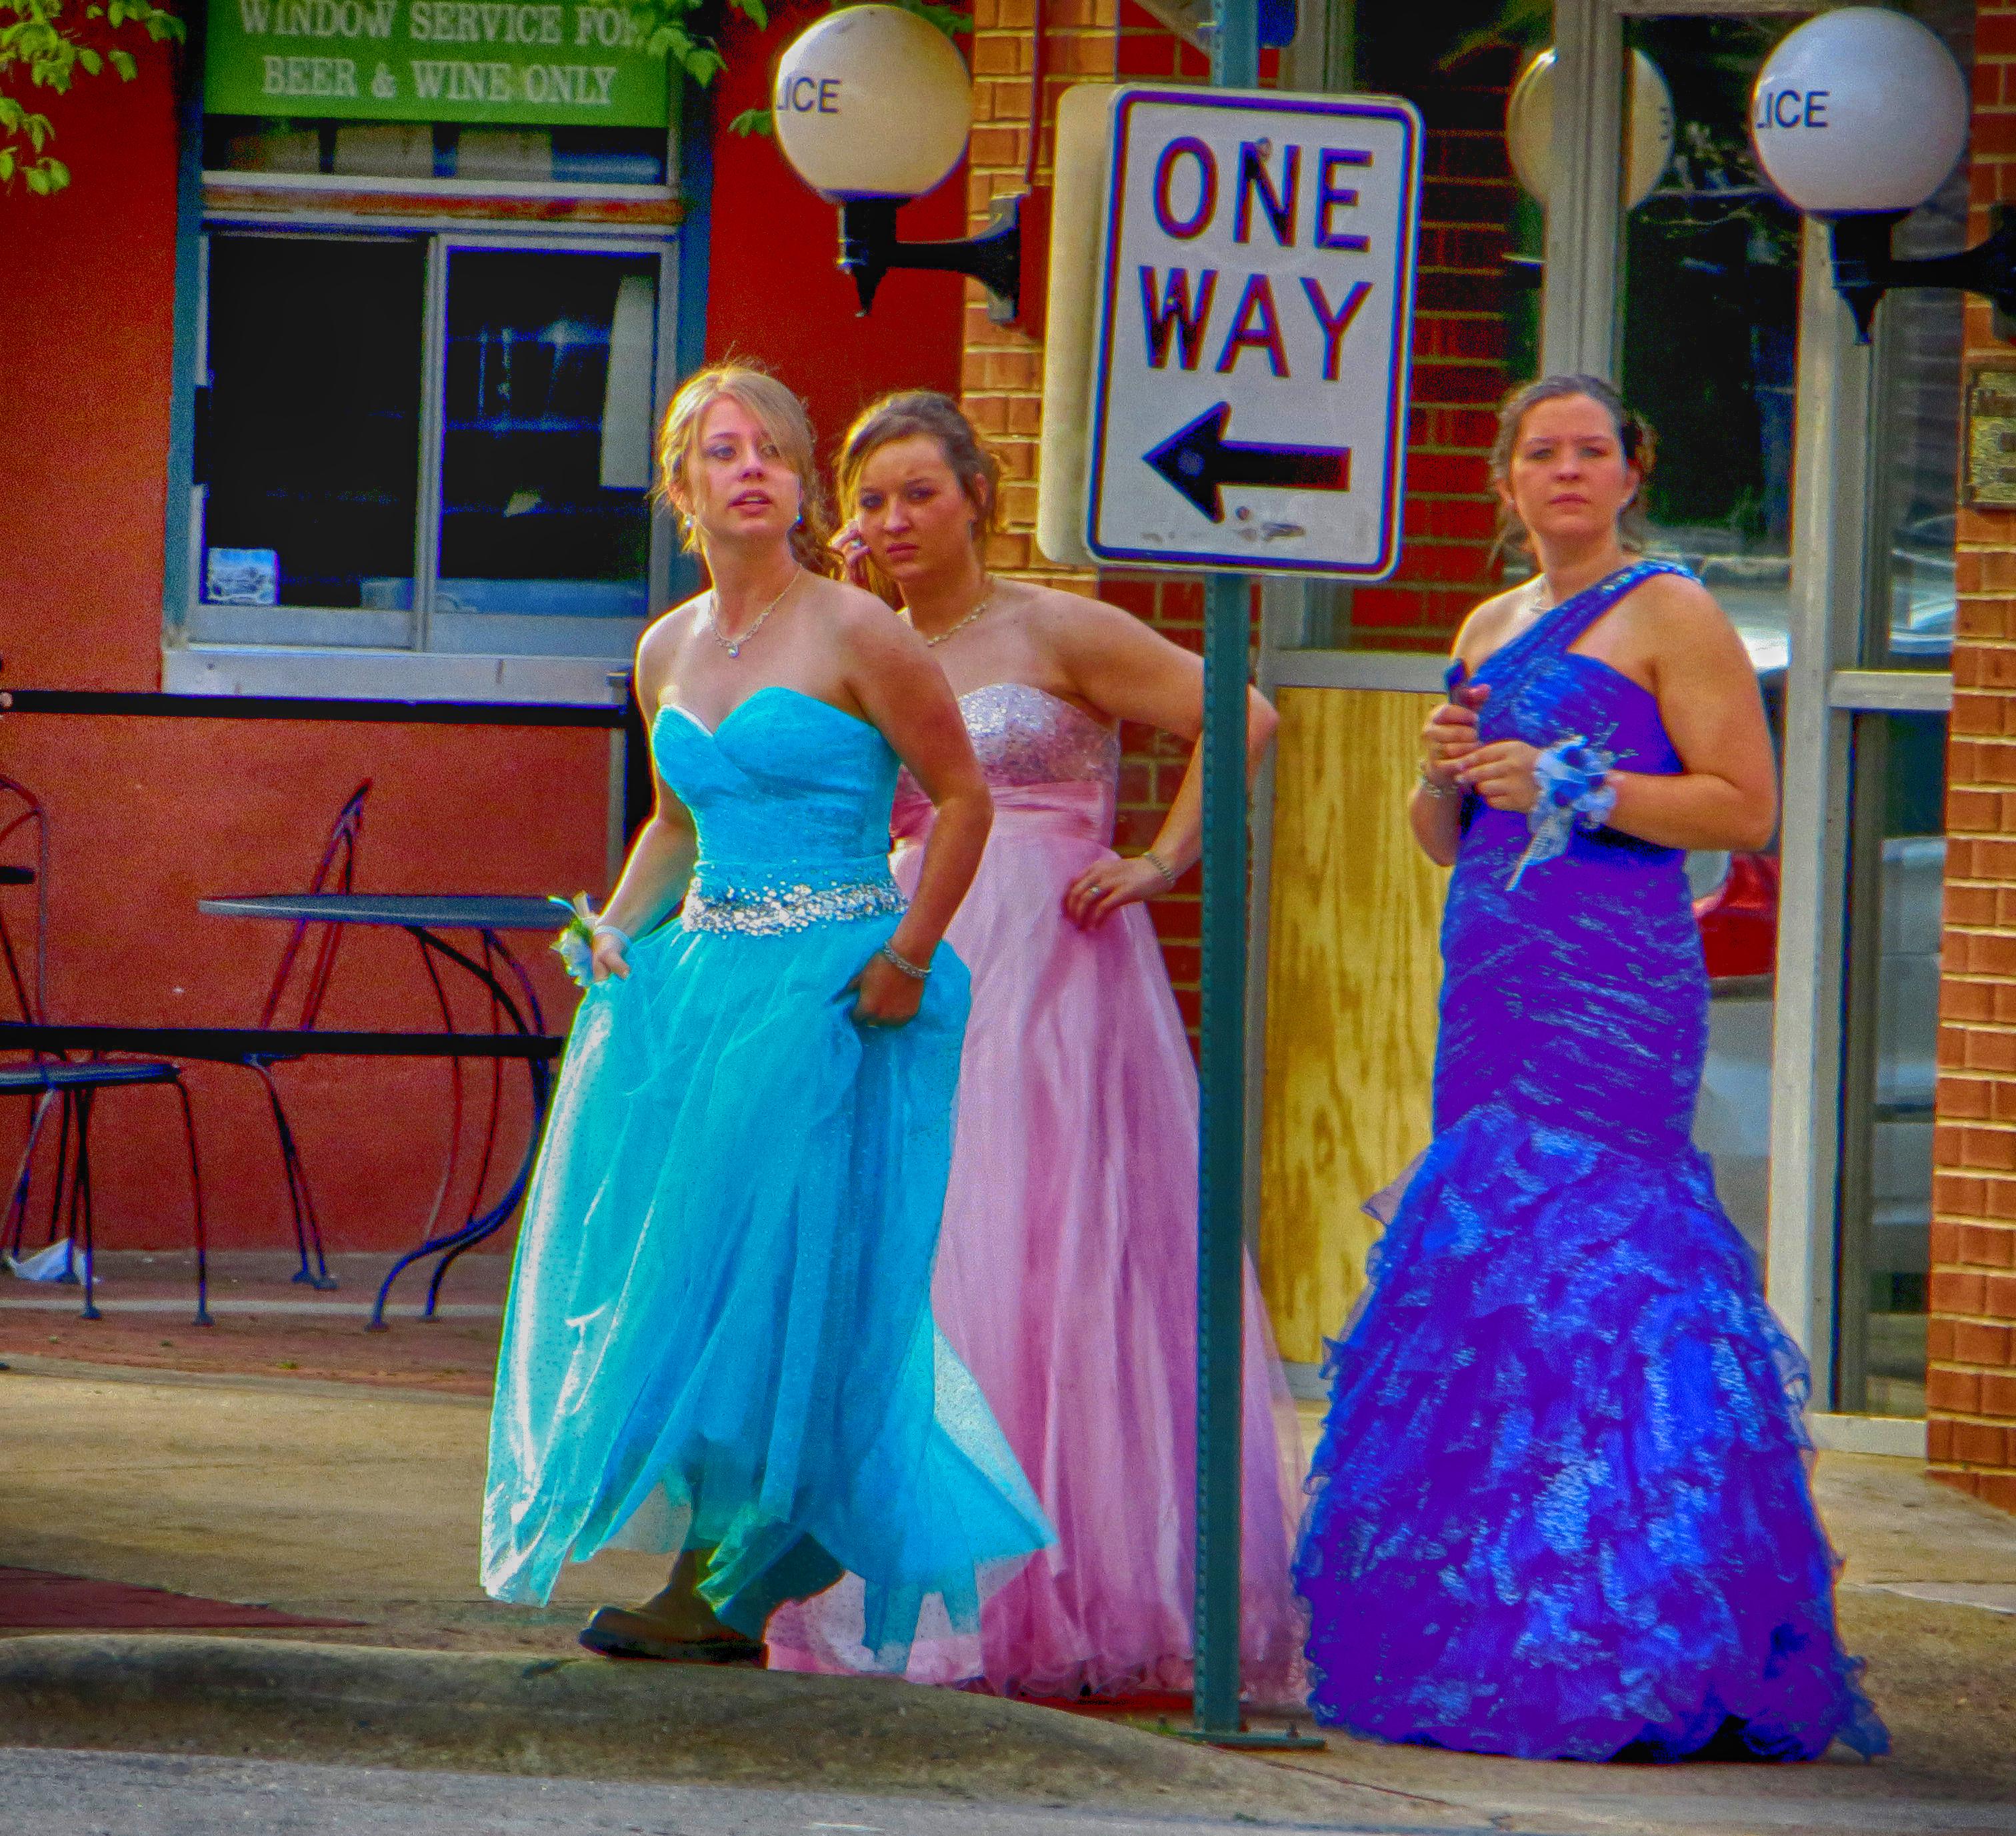 Prom Night Dress Up Games Free Online - Formal Dresses